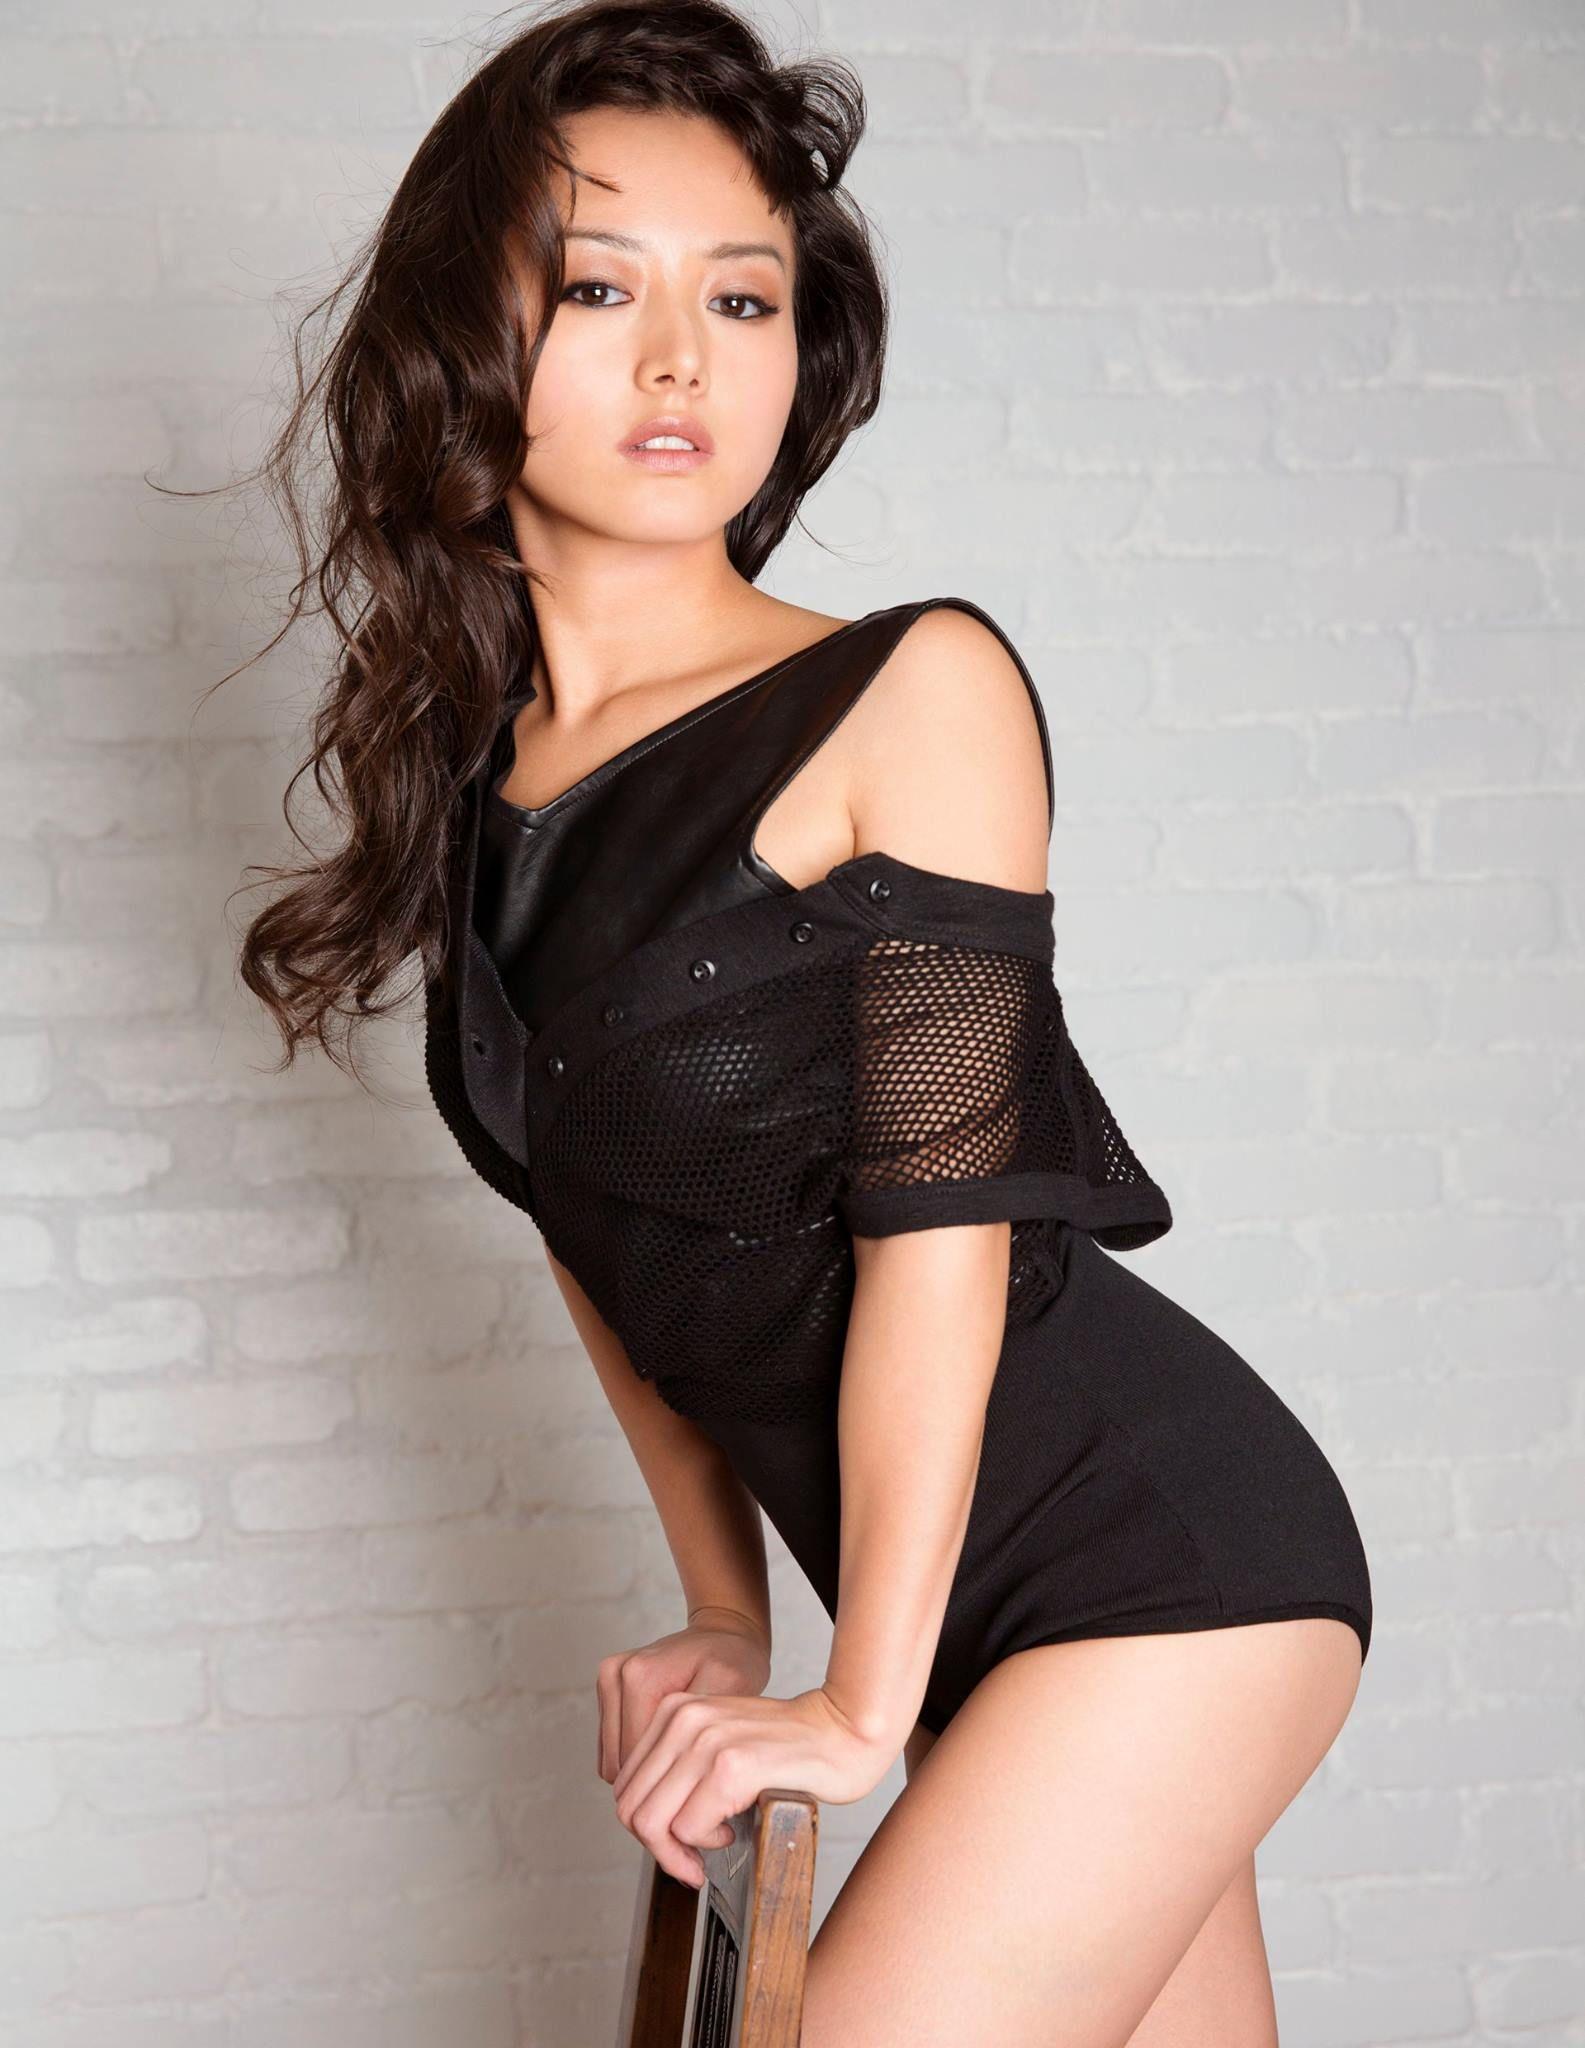 cum-japanese-nude-tuner-models-latino